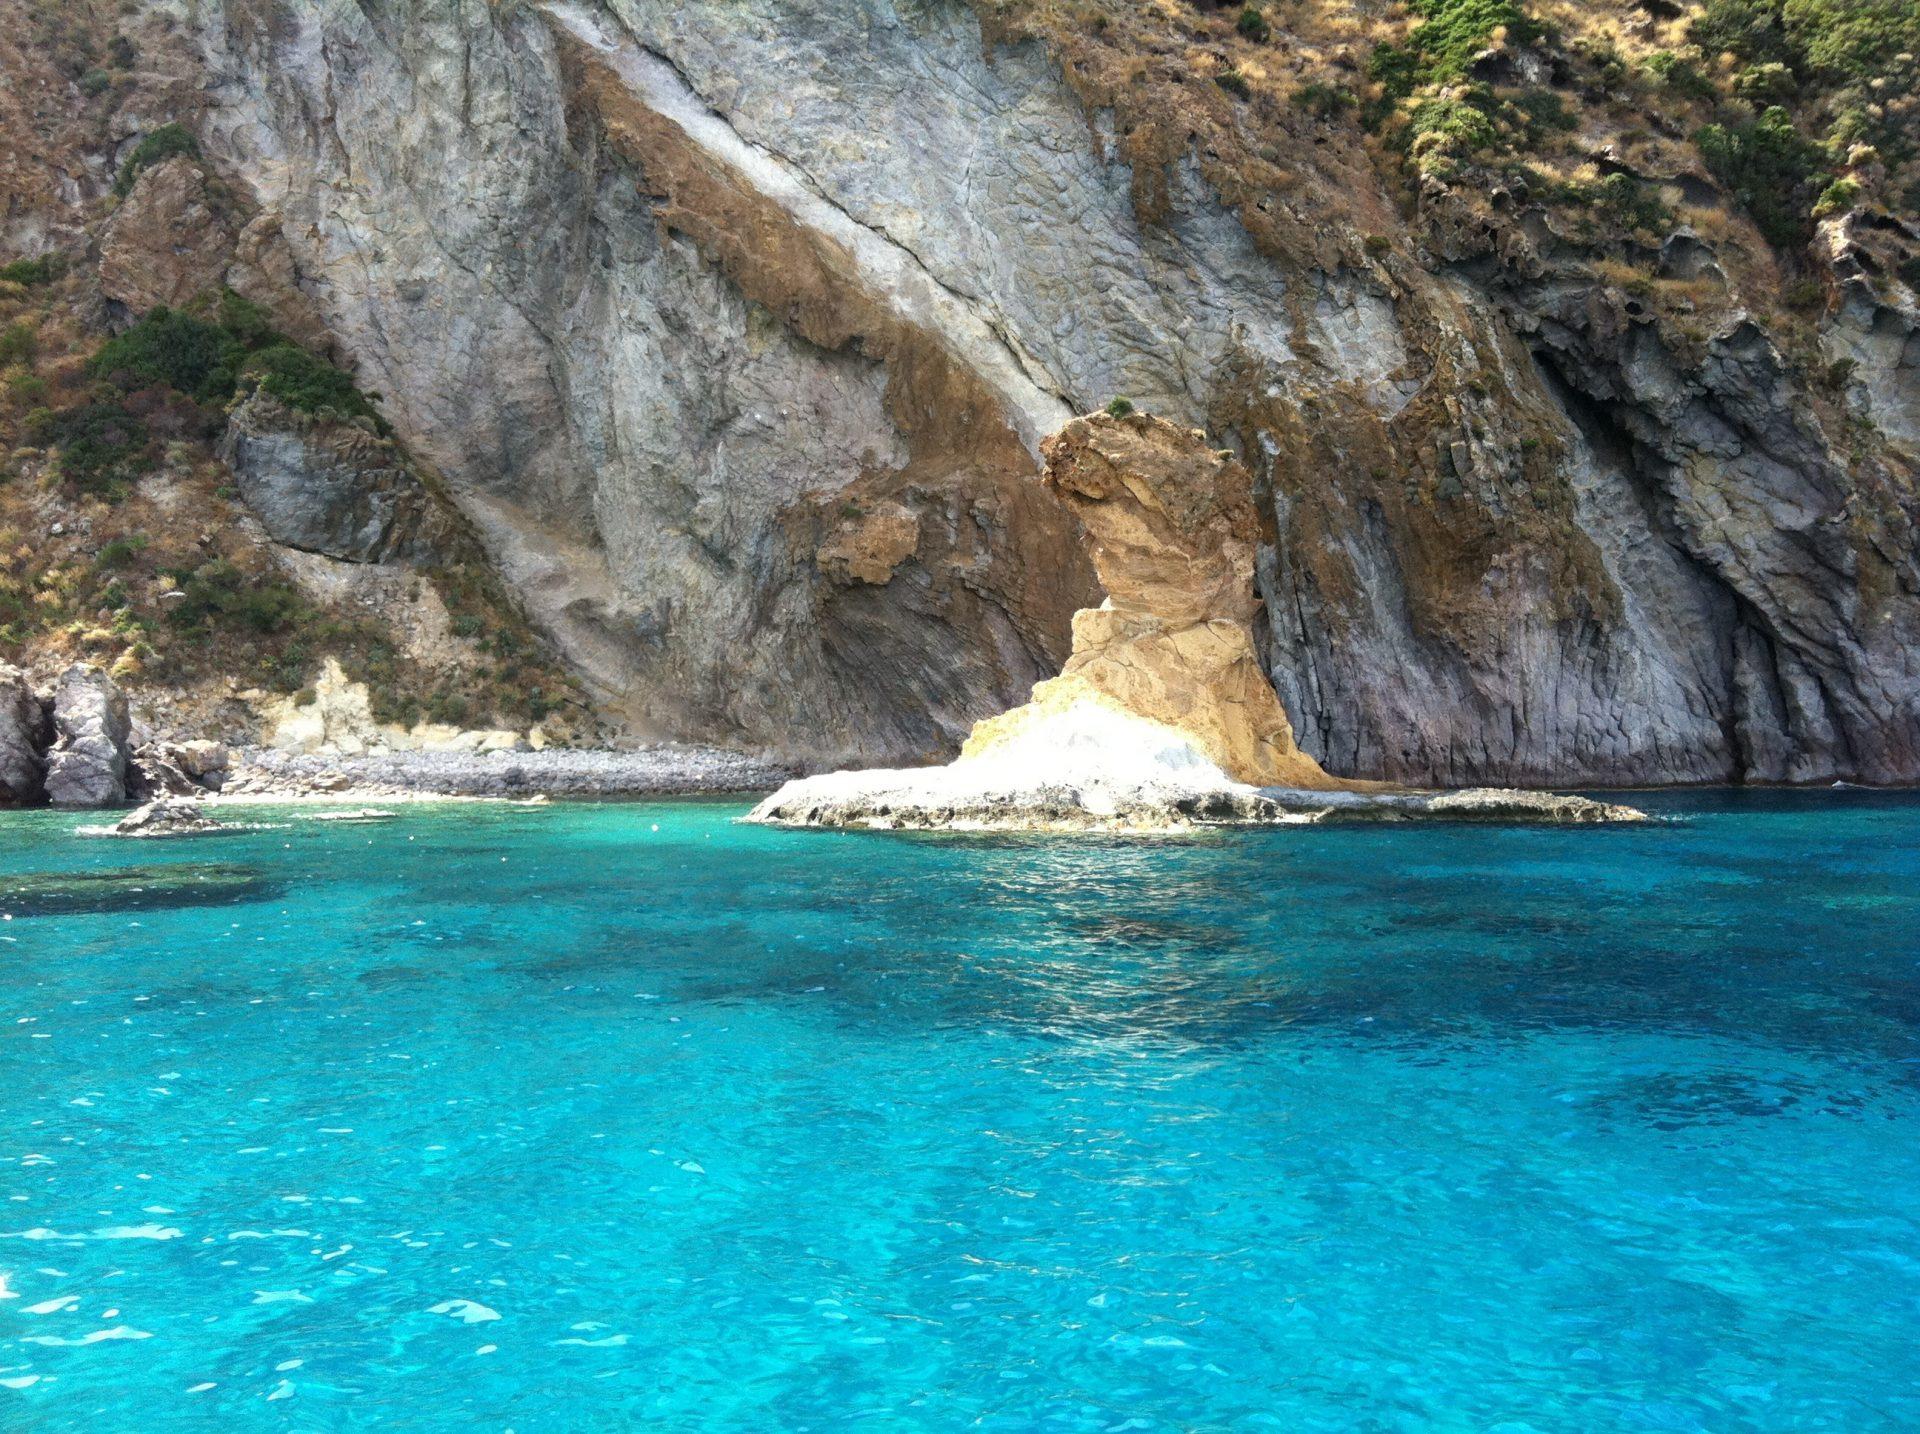 Visita Ponza, Palmarola, Ventotene, Zannone | Park Hotel Latina